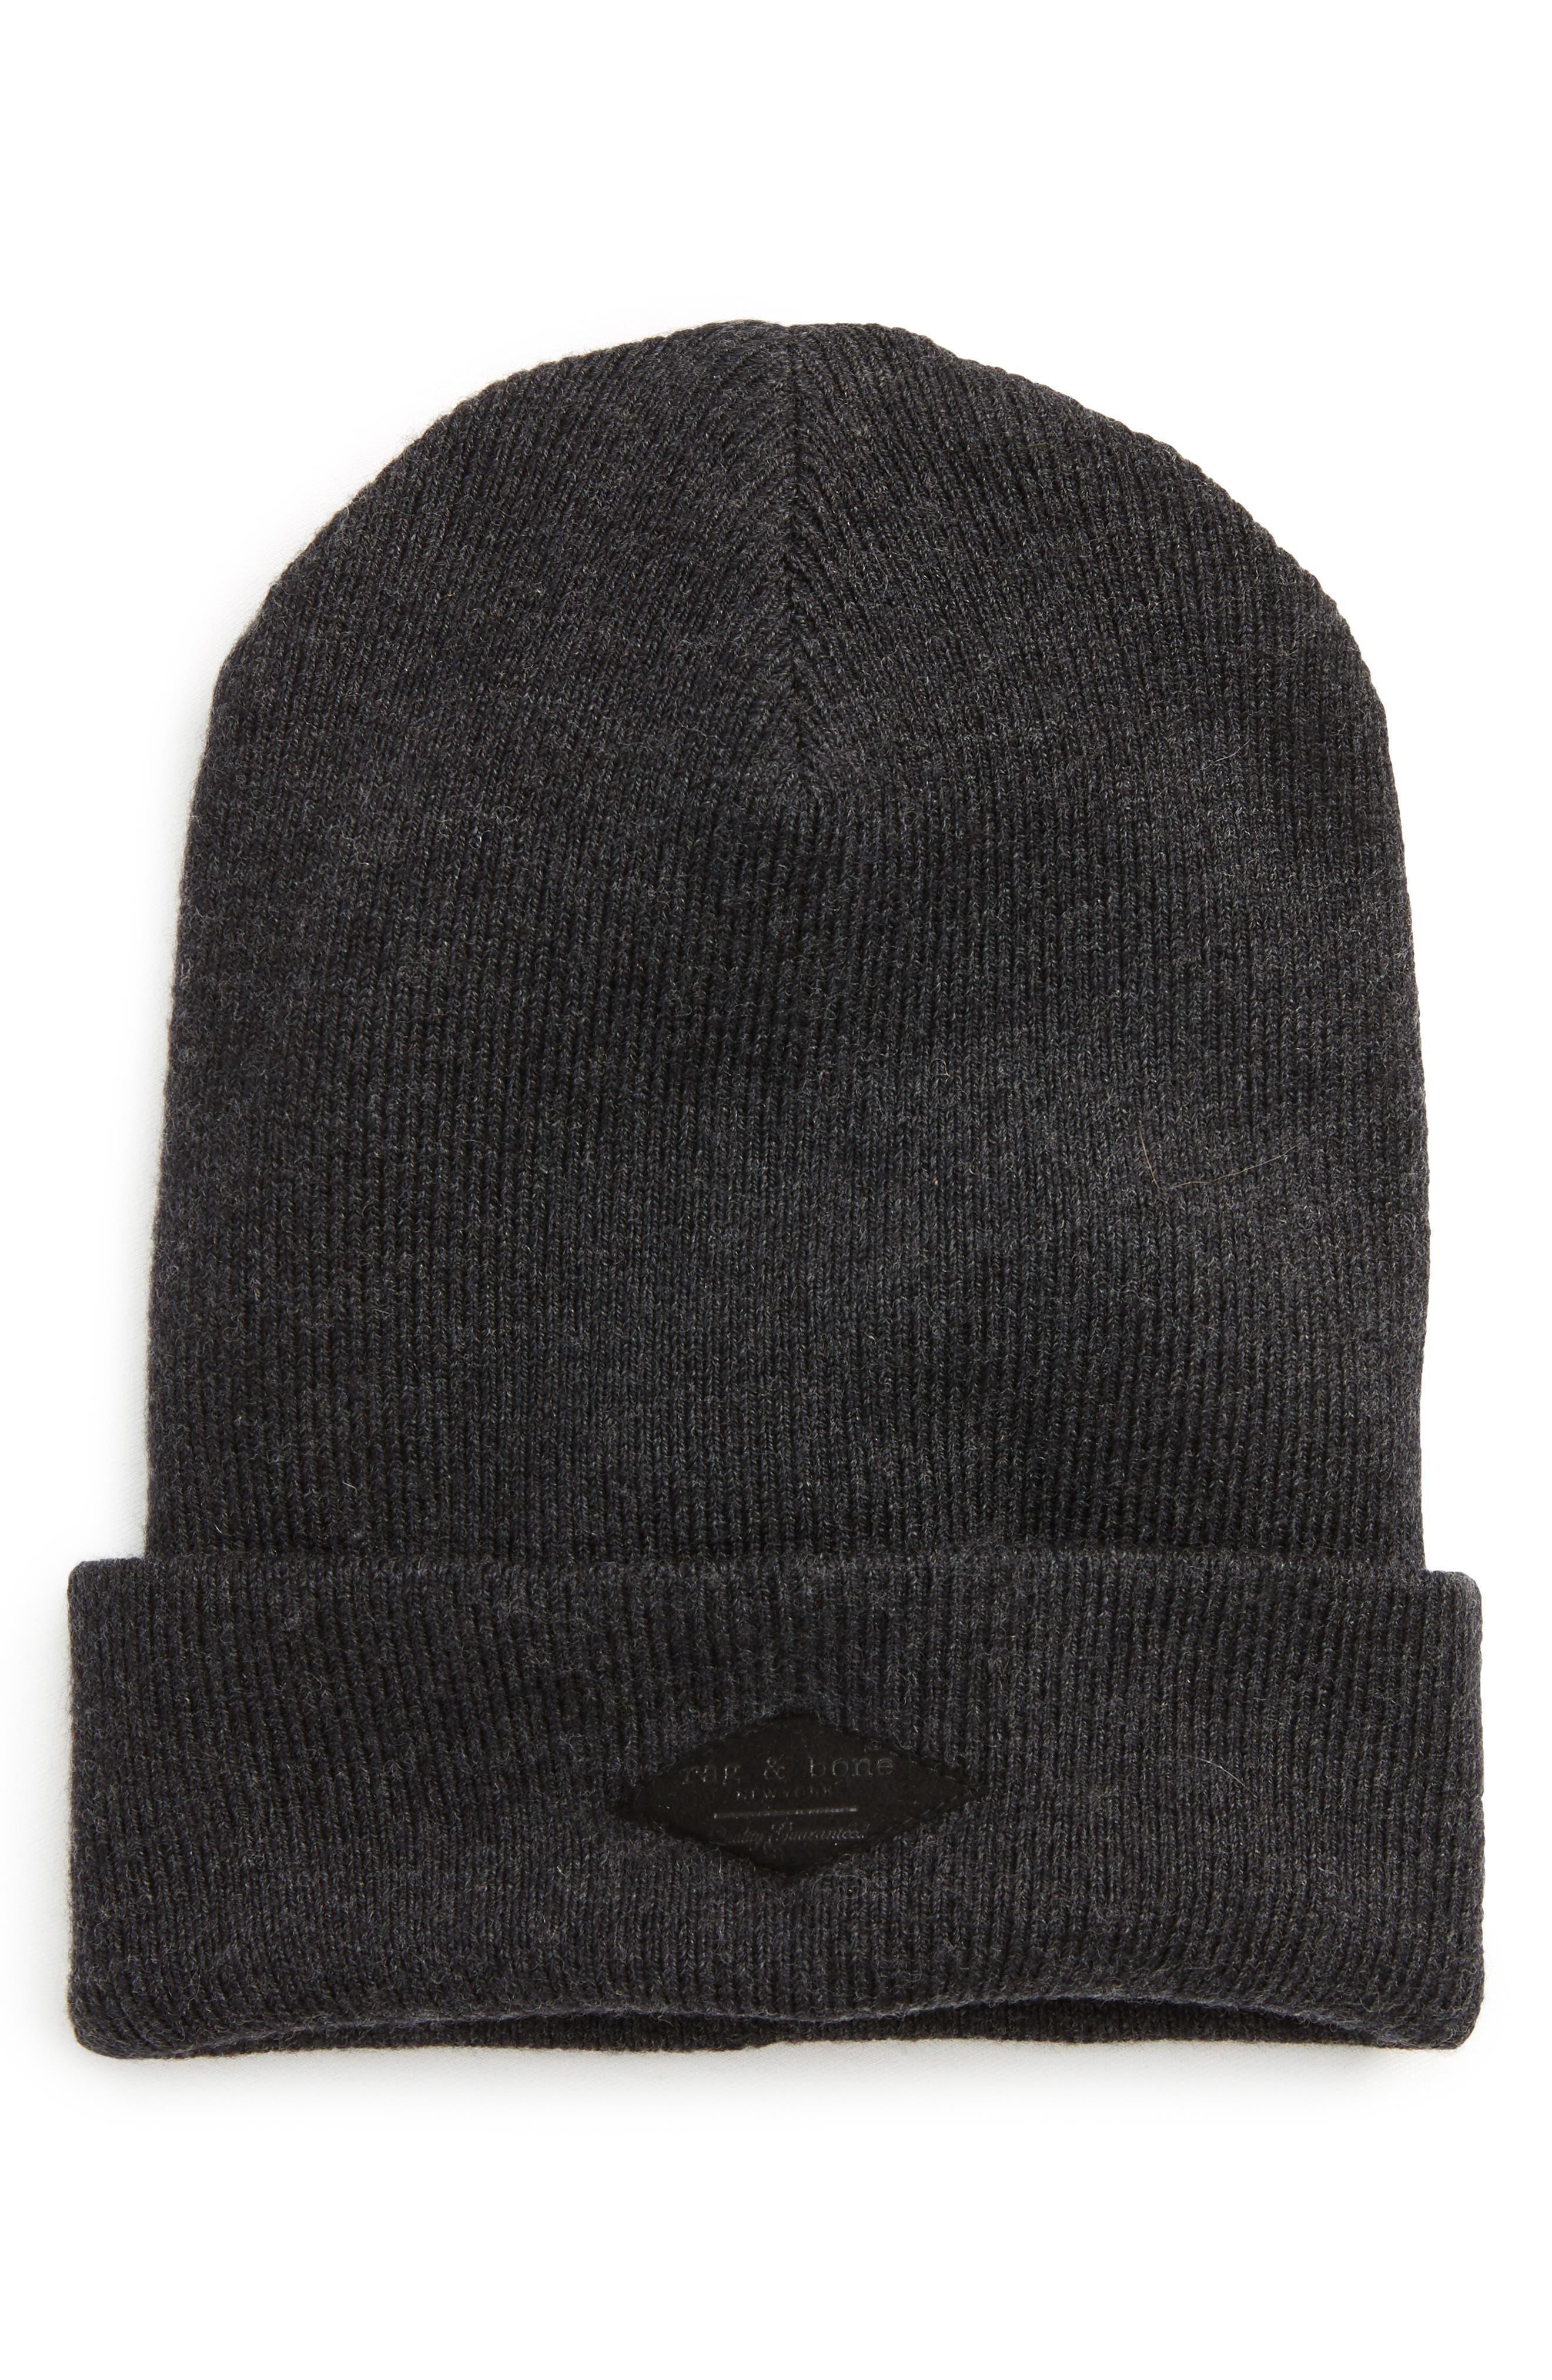 Addison Stretch Merino Wool Knit Cap,                             Main thumbnail 1, color,                             010